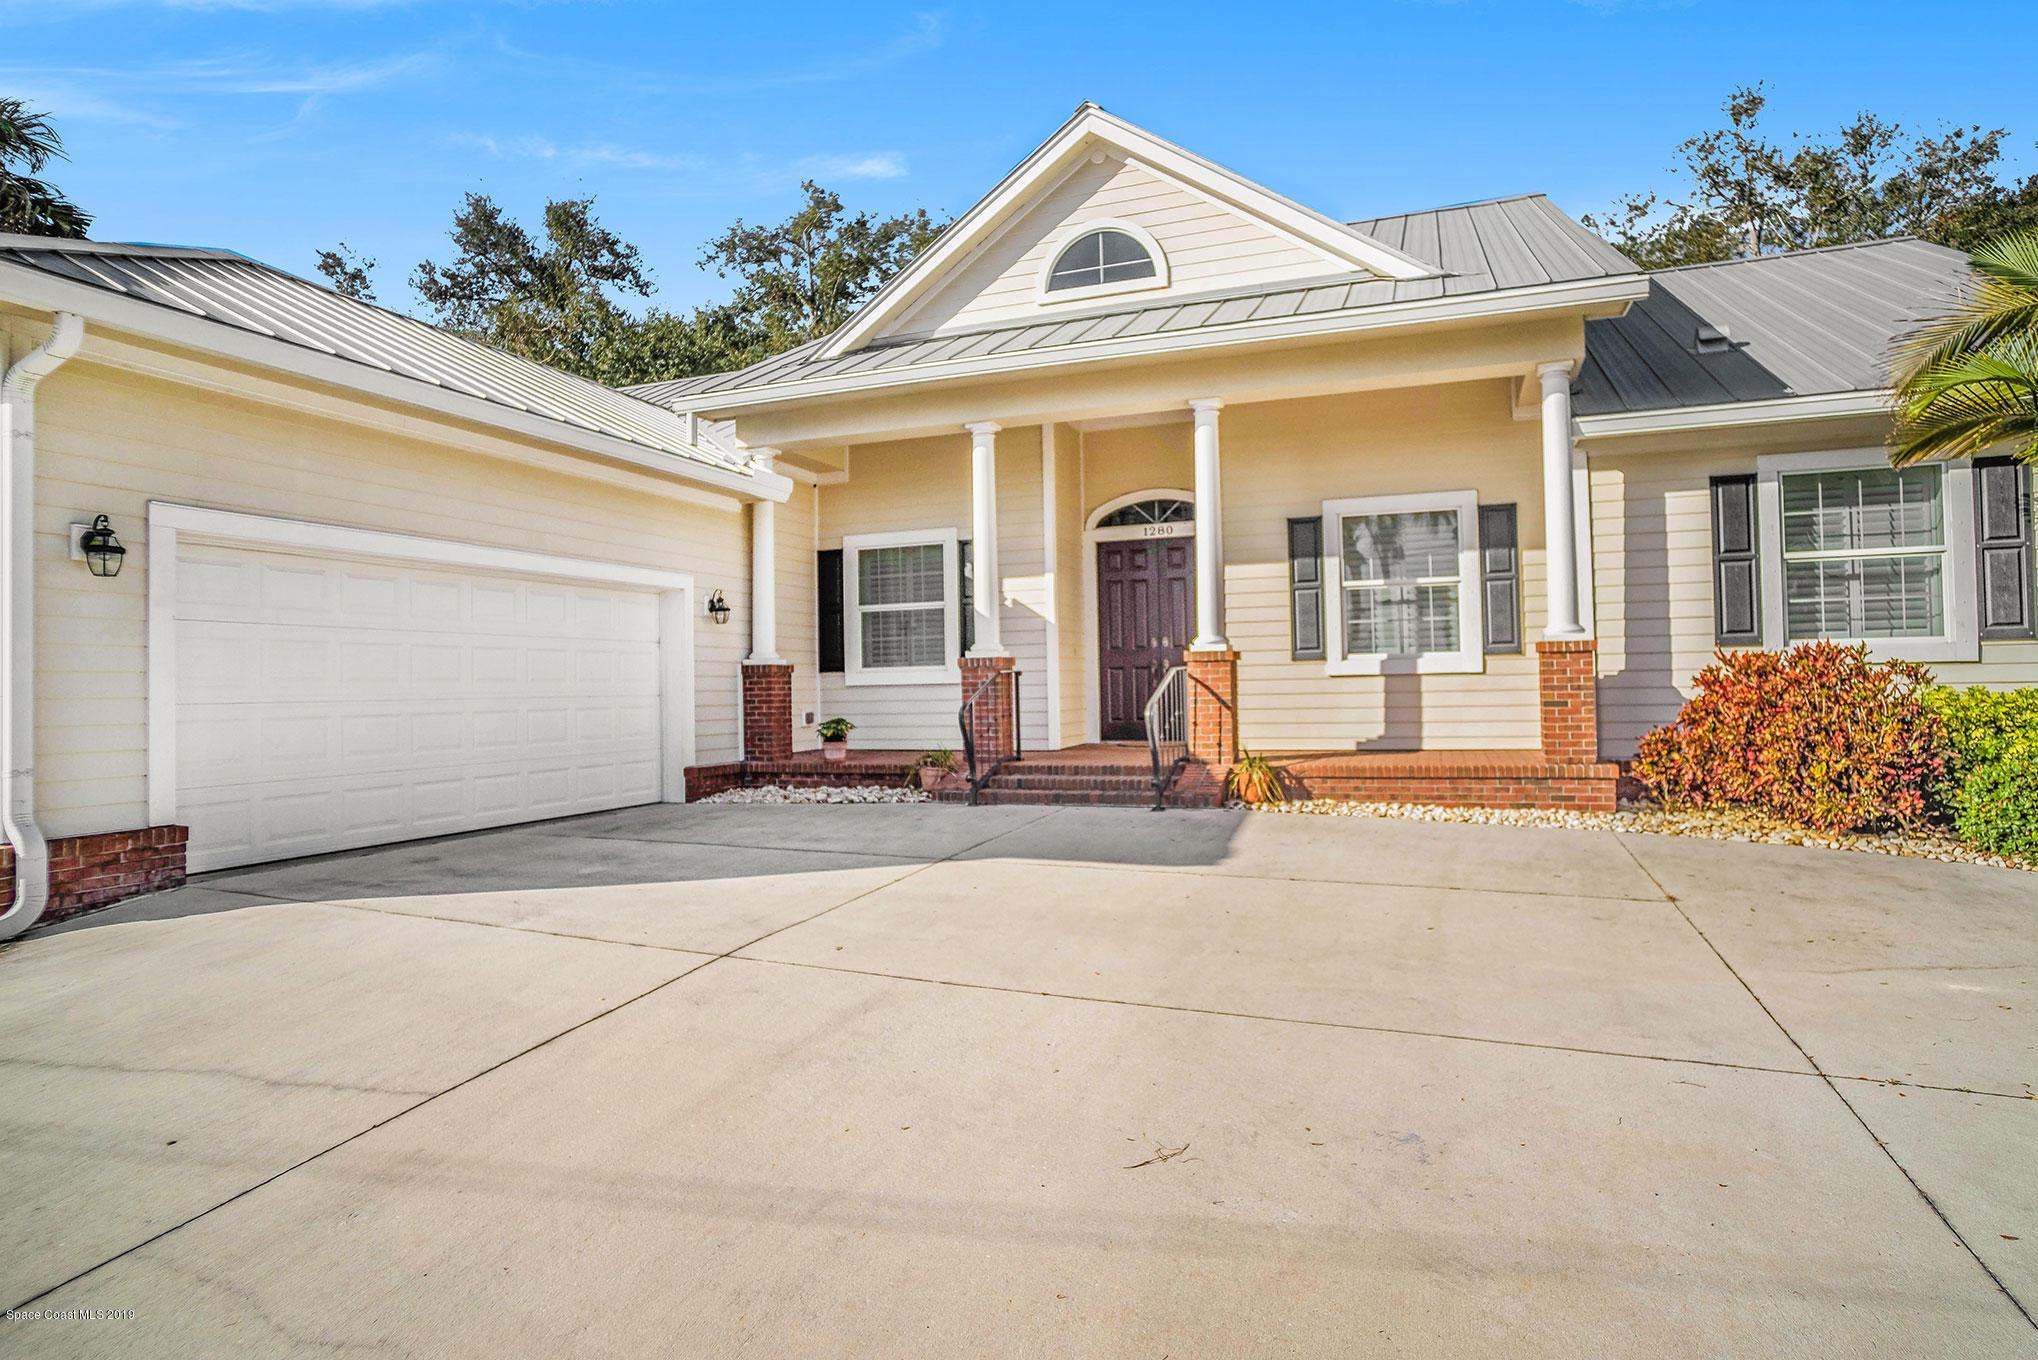 Single Family Home for Sale at 1280 Houston 1280 Houston Melbourne, Florida 32935 United States